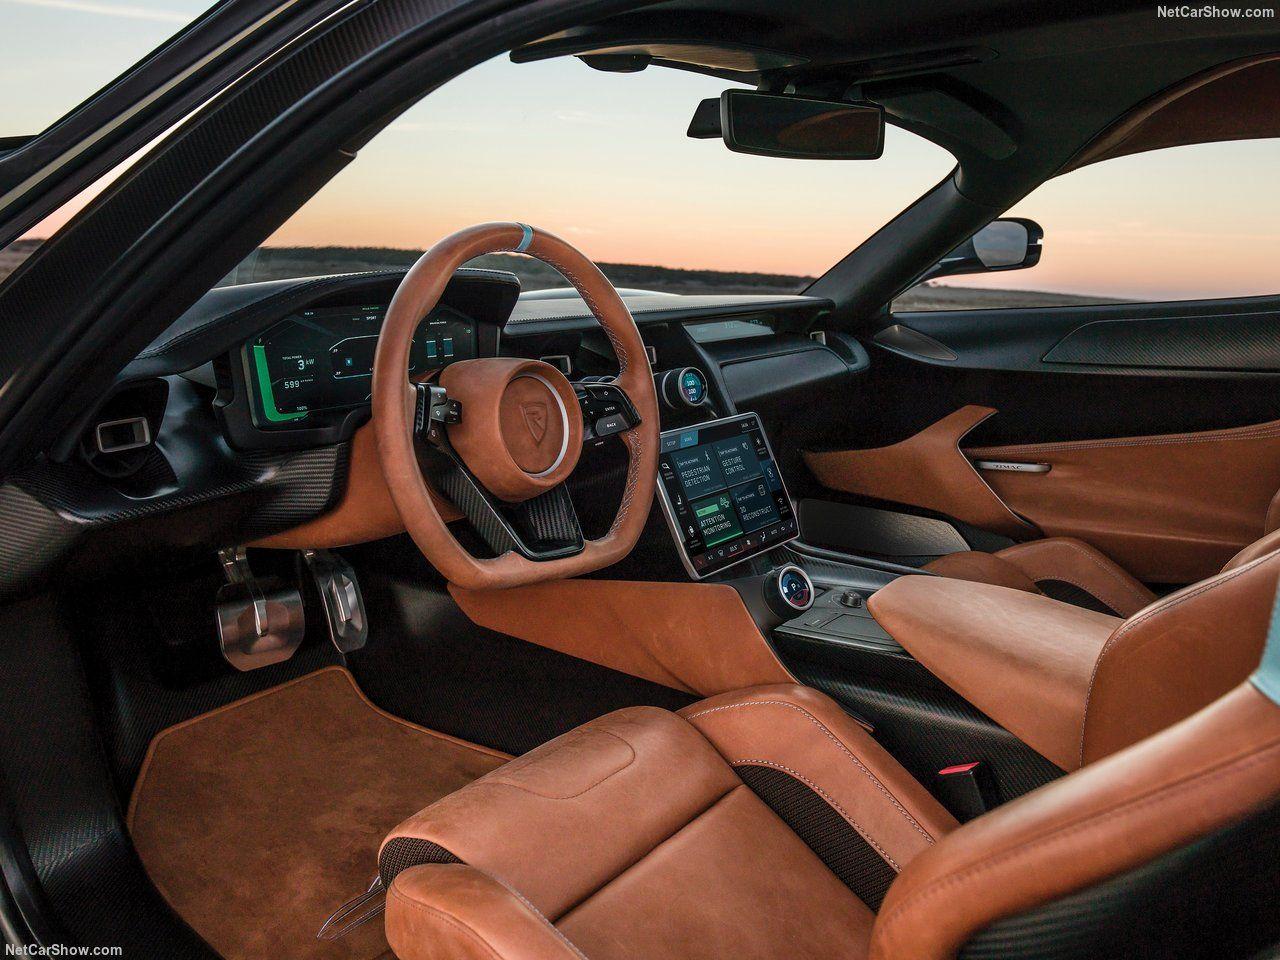 Por dentro do Rimac Concept Two, banco, painel e volante